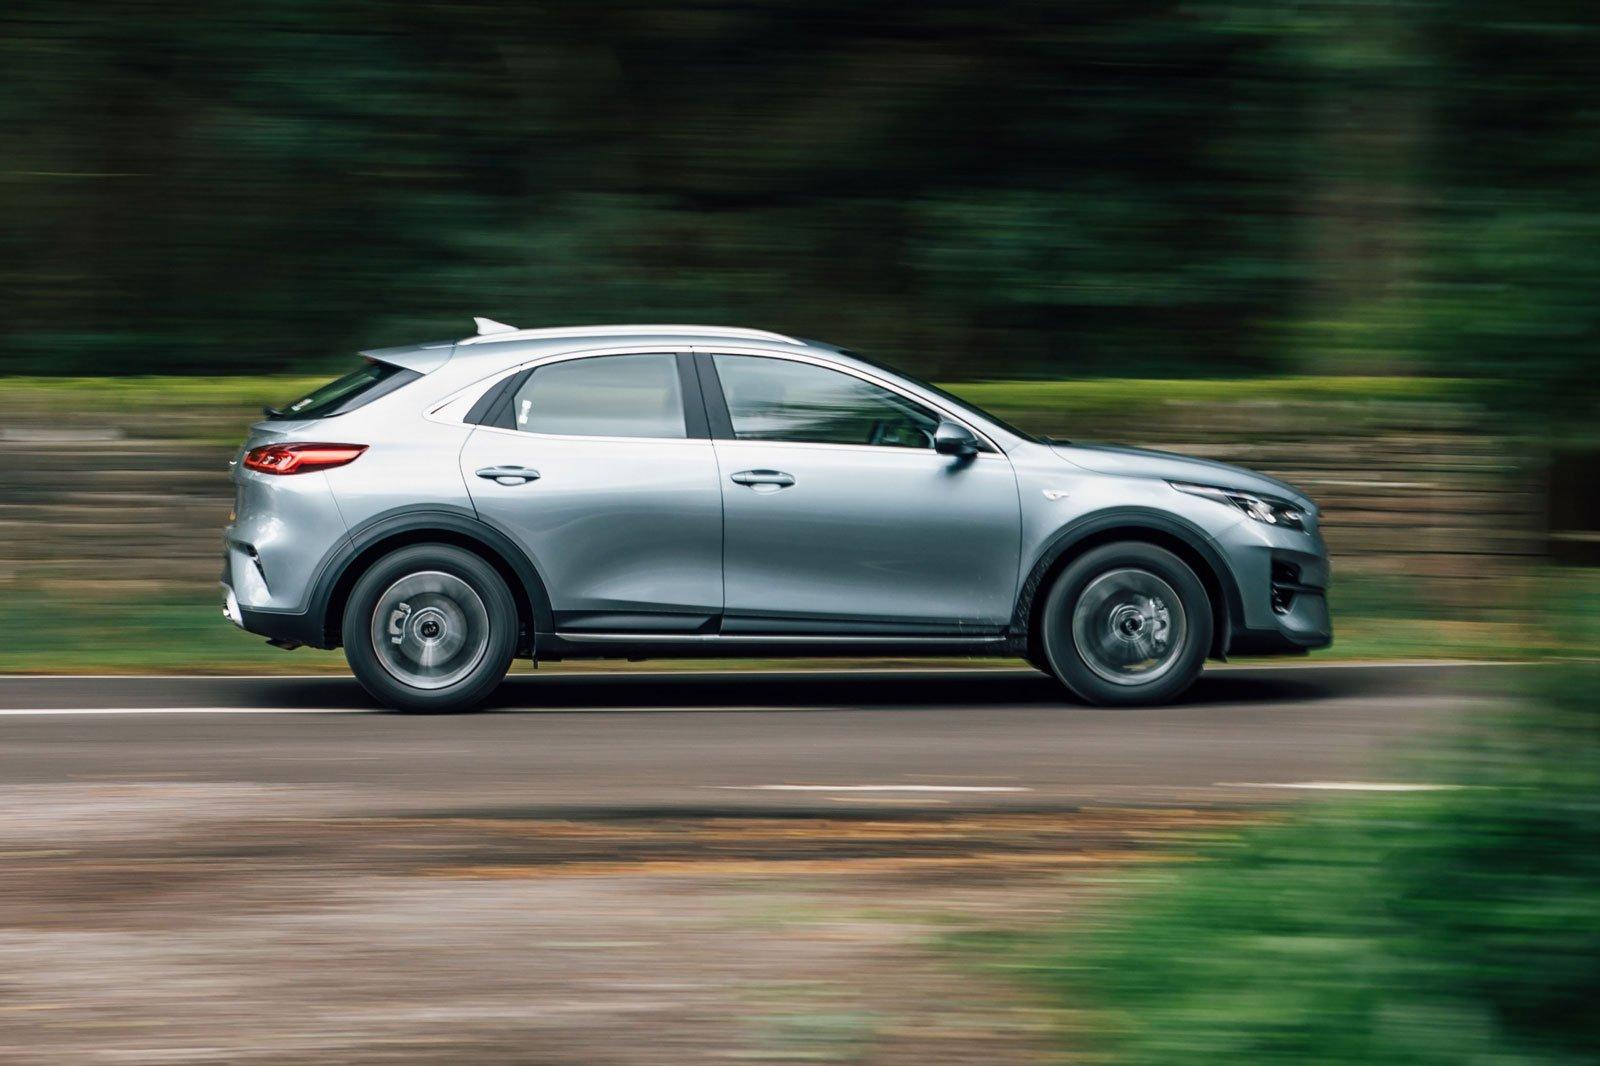 2019 kia xceed 1.0 '2' silver side profile driving